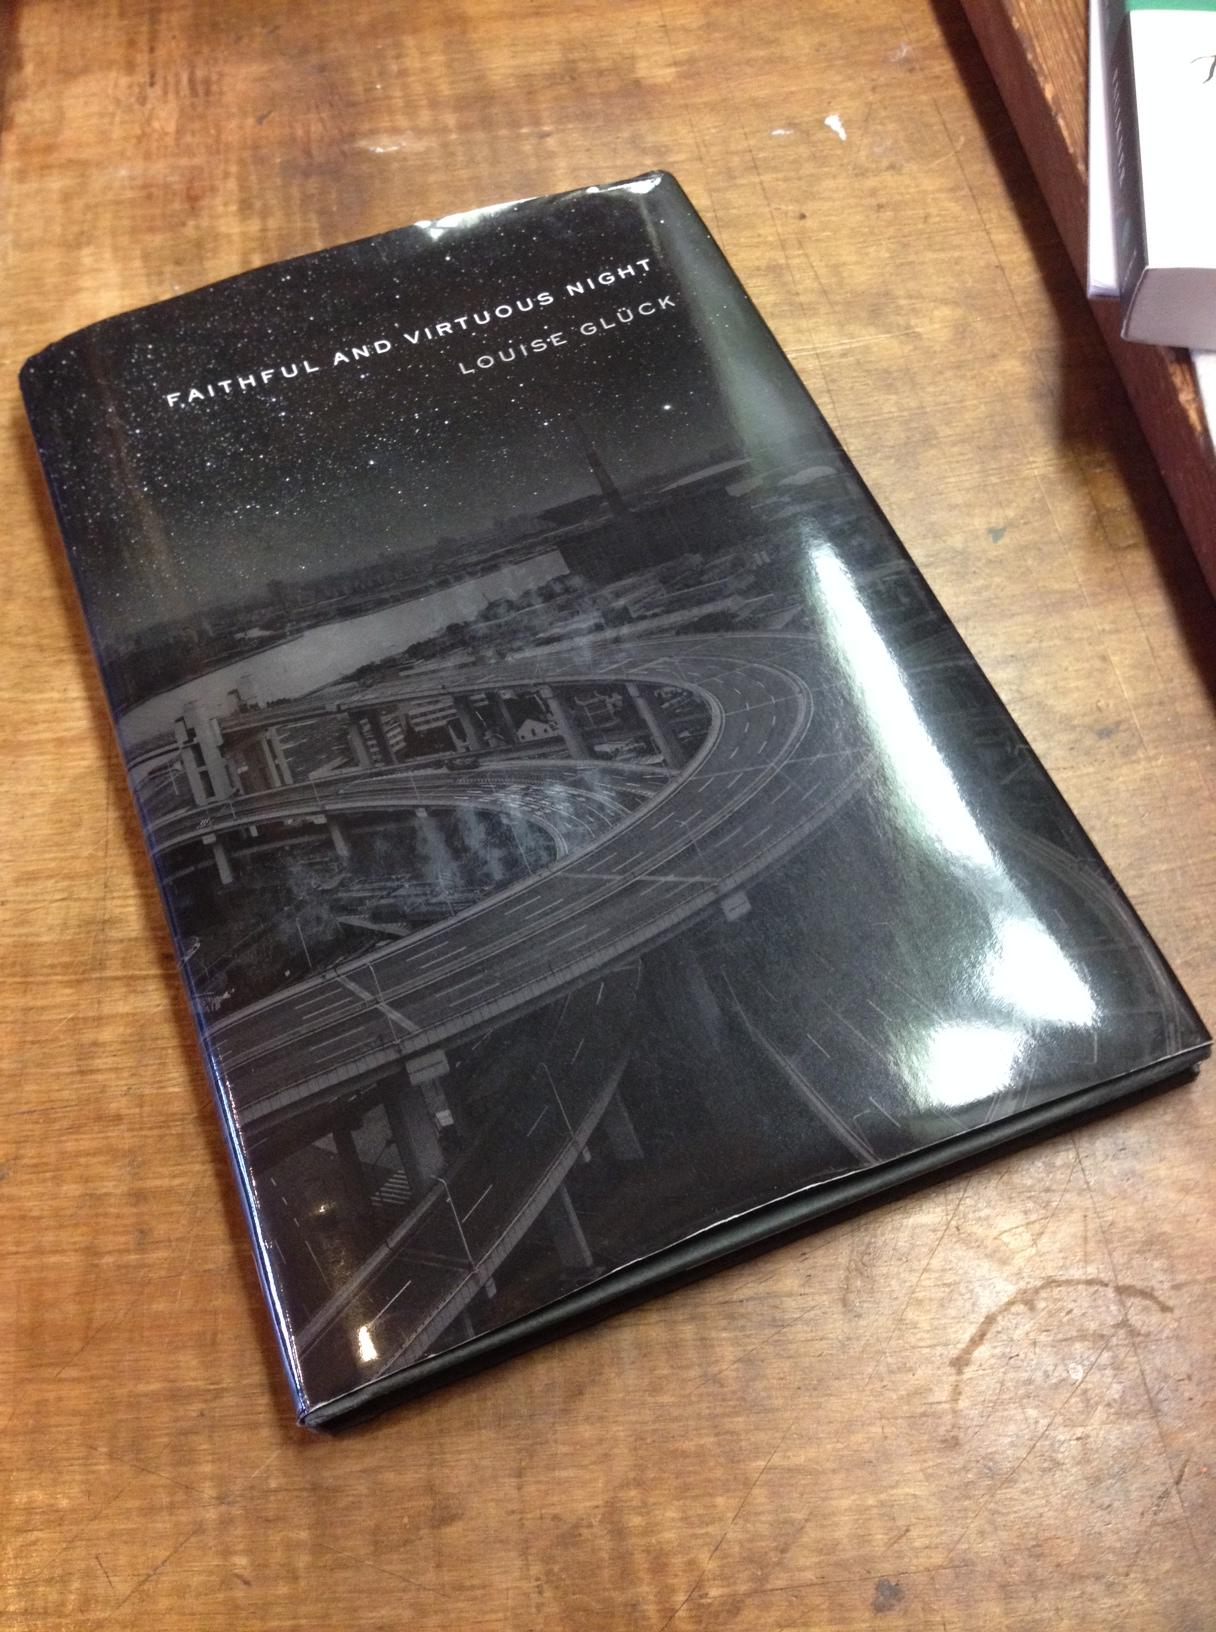 Louise Gluck S Faithful And Virtuous Night Faulkner House Books